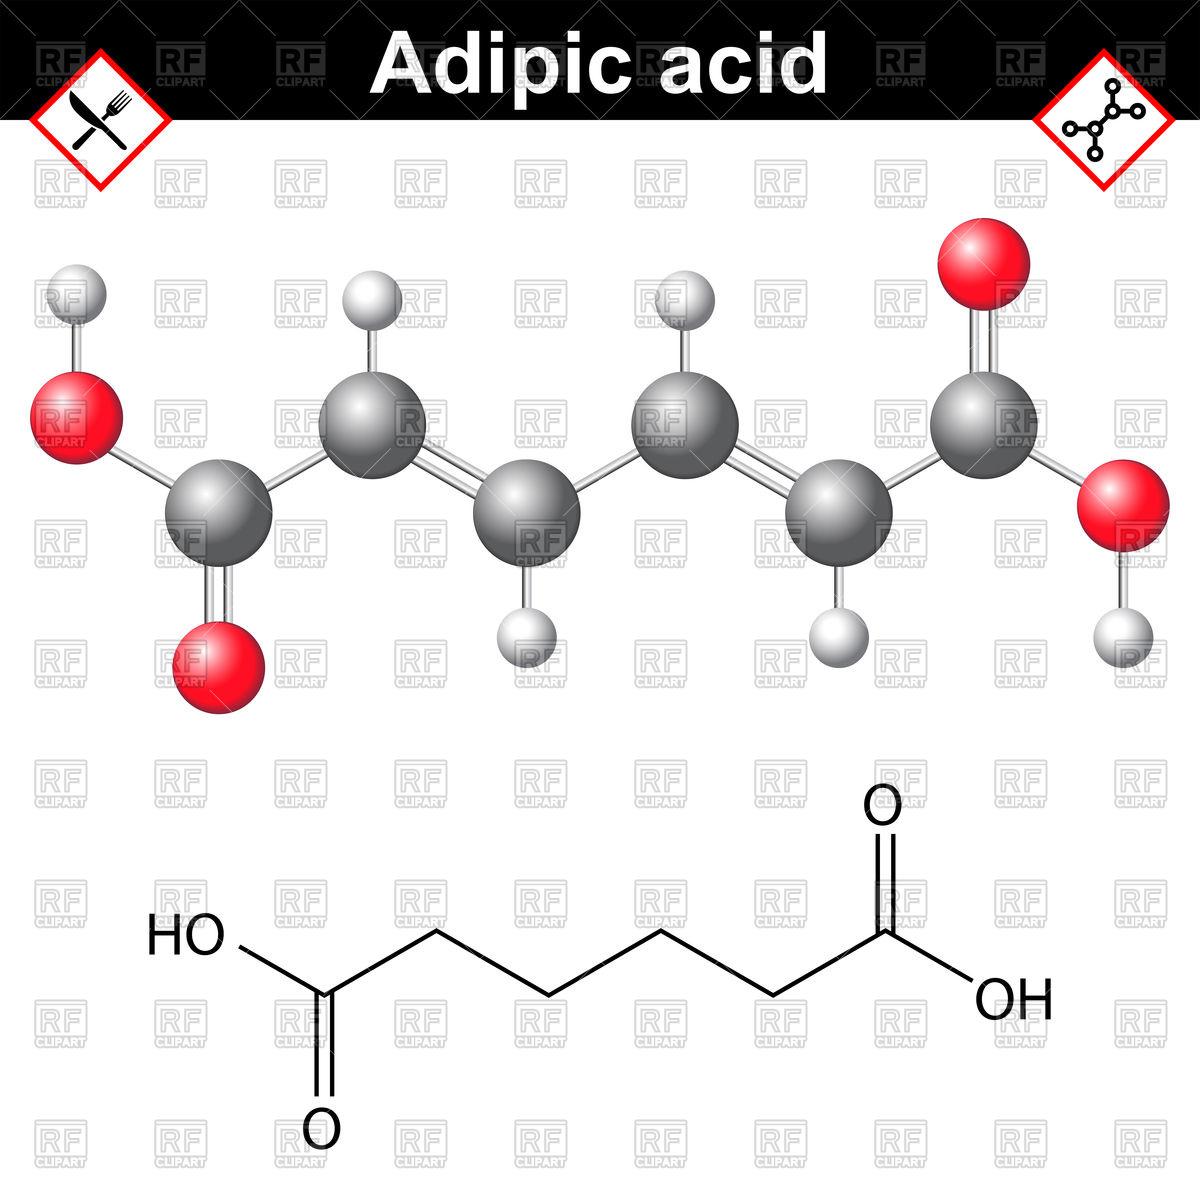 Adipic acid chemical formula.